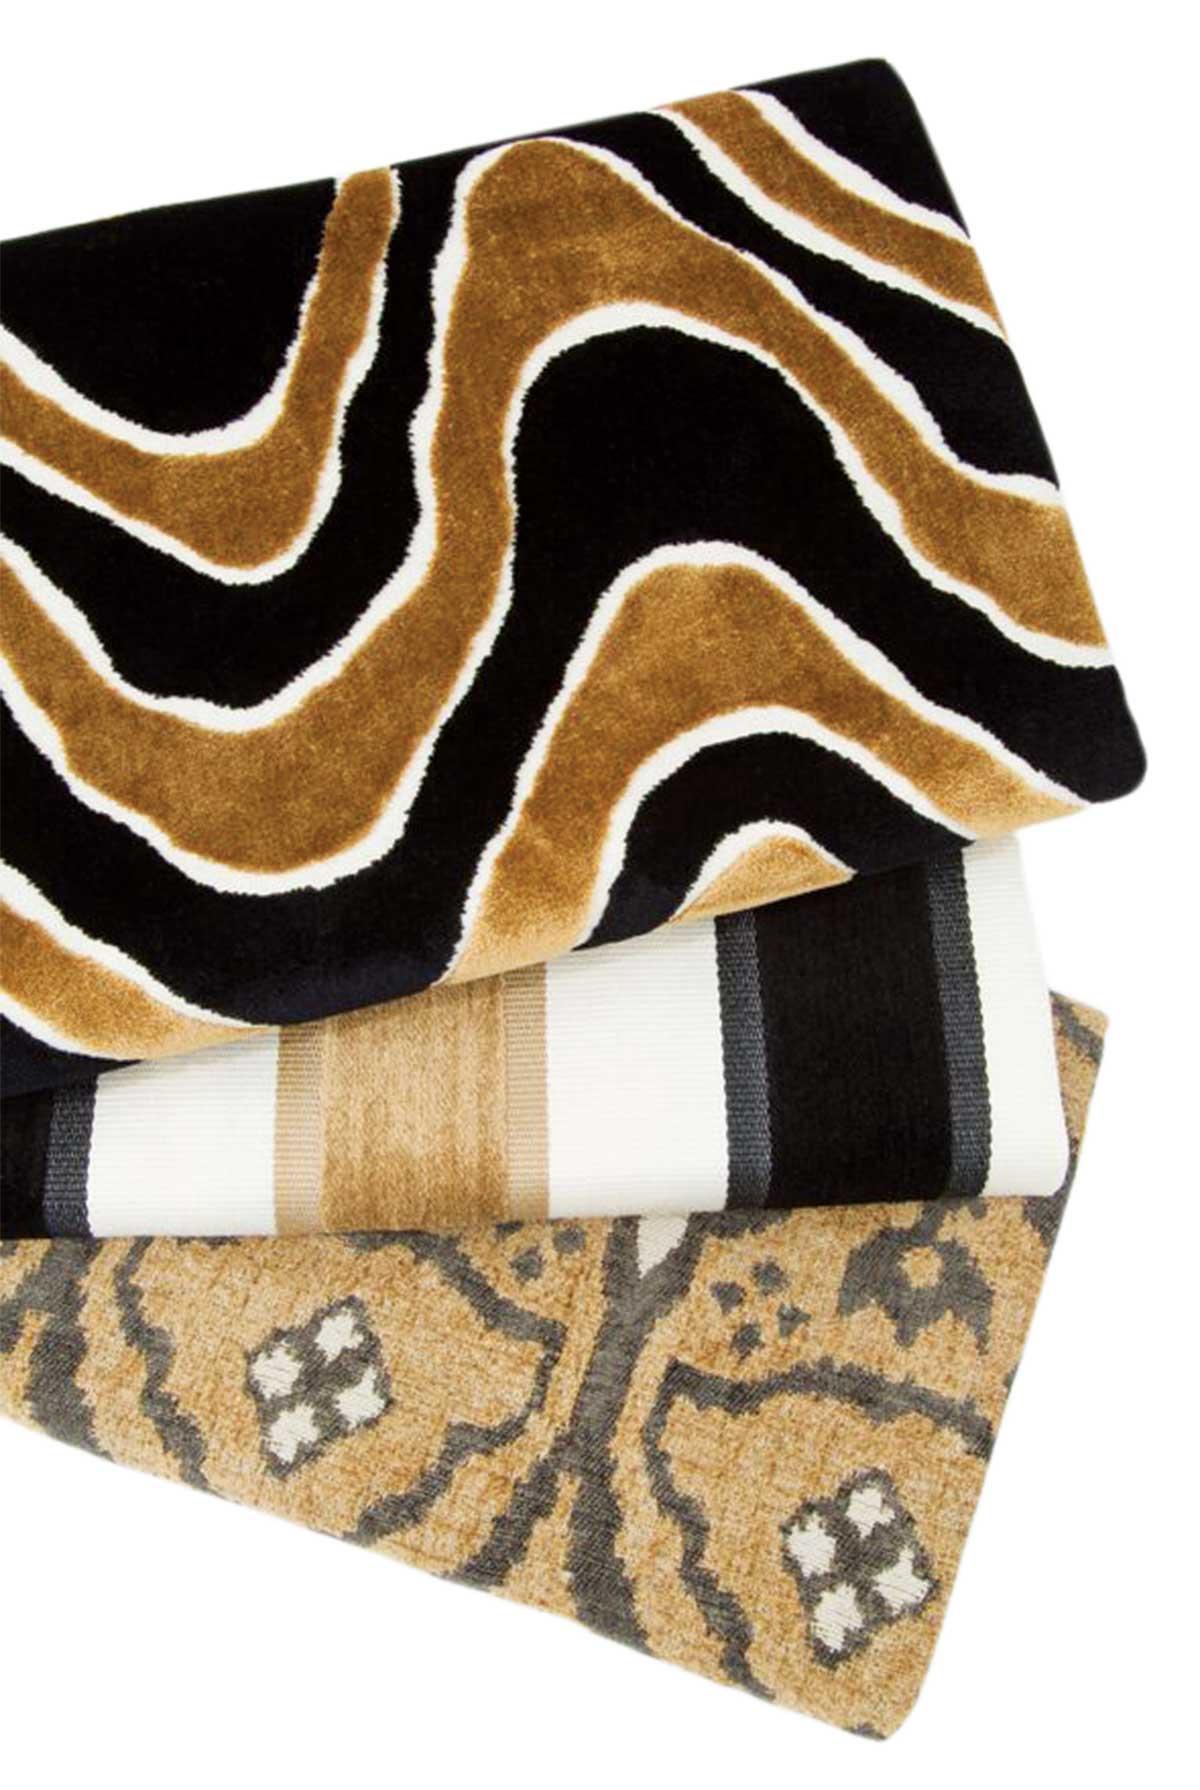 Robert-Allen-upholstery,-ed-pick-13